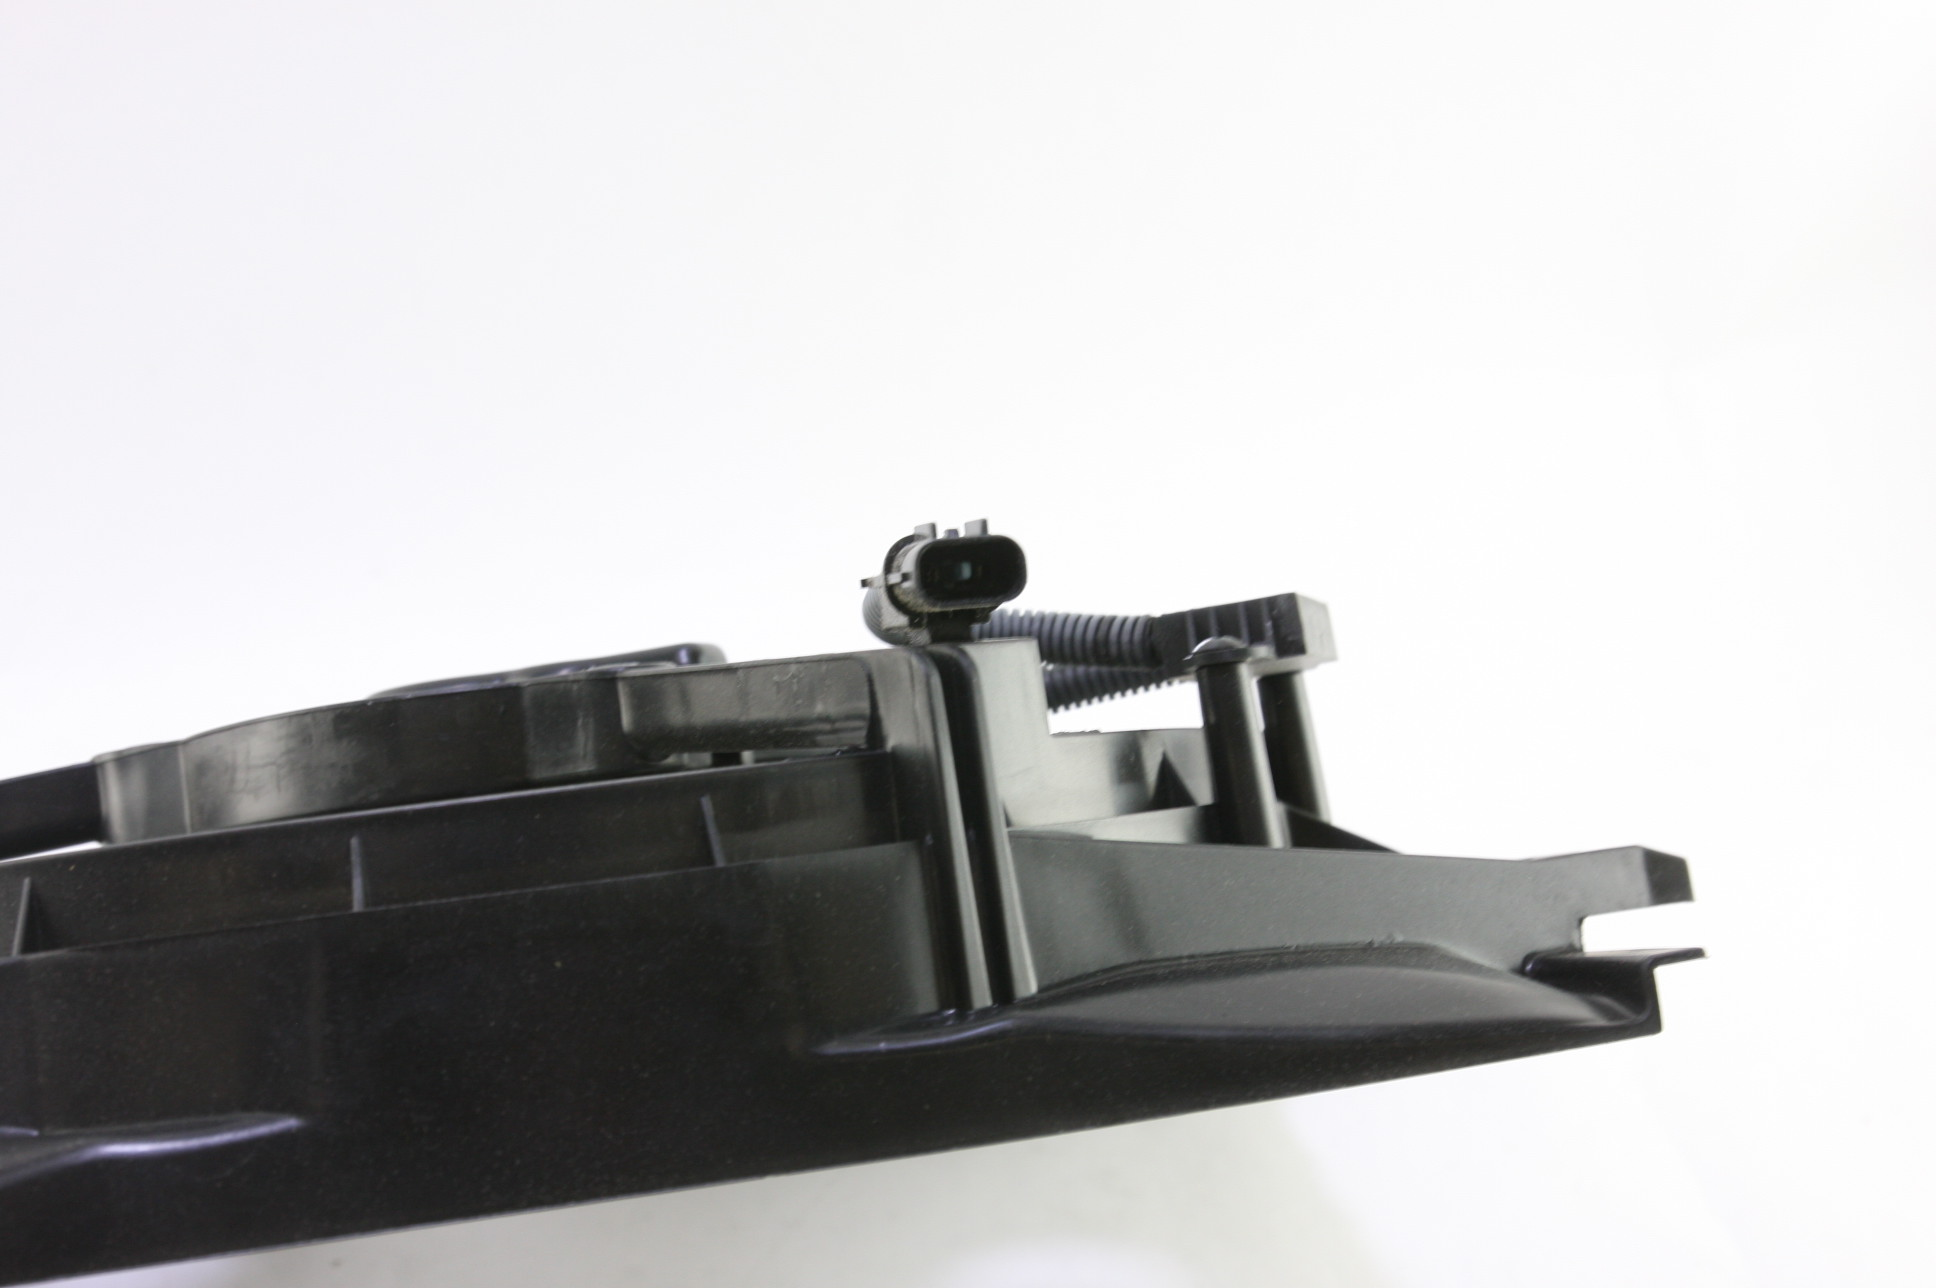 ~ New Kia OEM 977301G000 Kia Rio Radiator Condenser Fan Motor Free Shipping - image 6